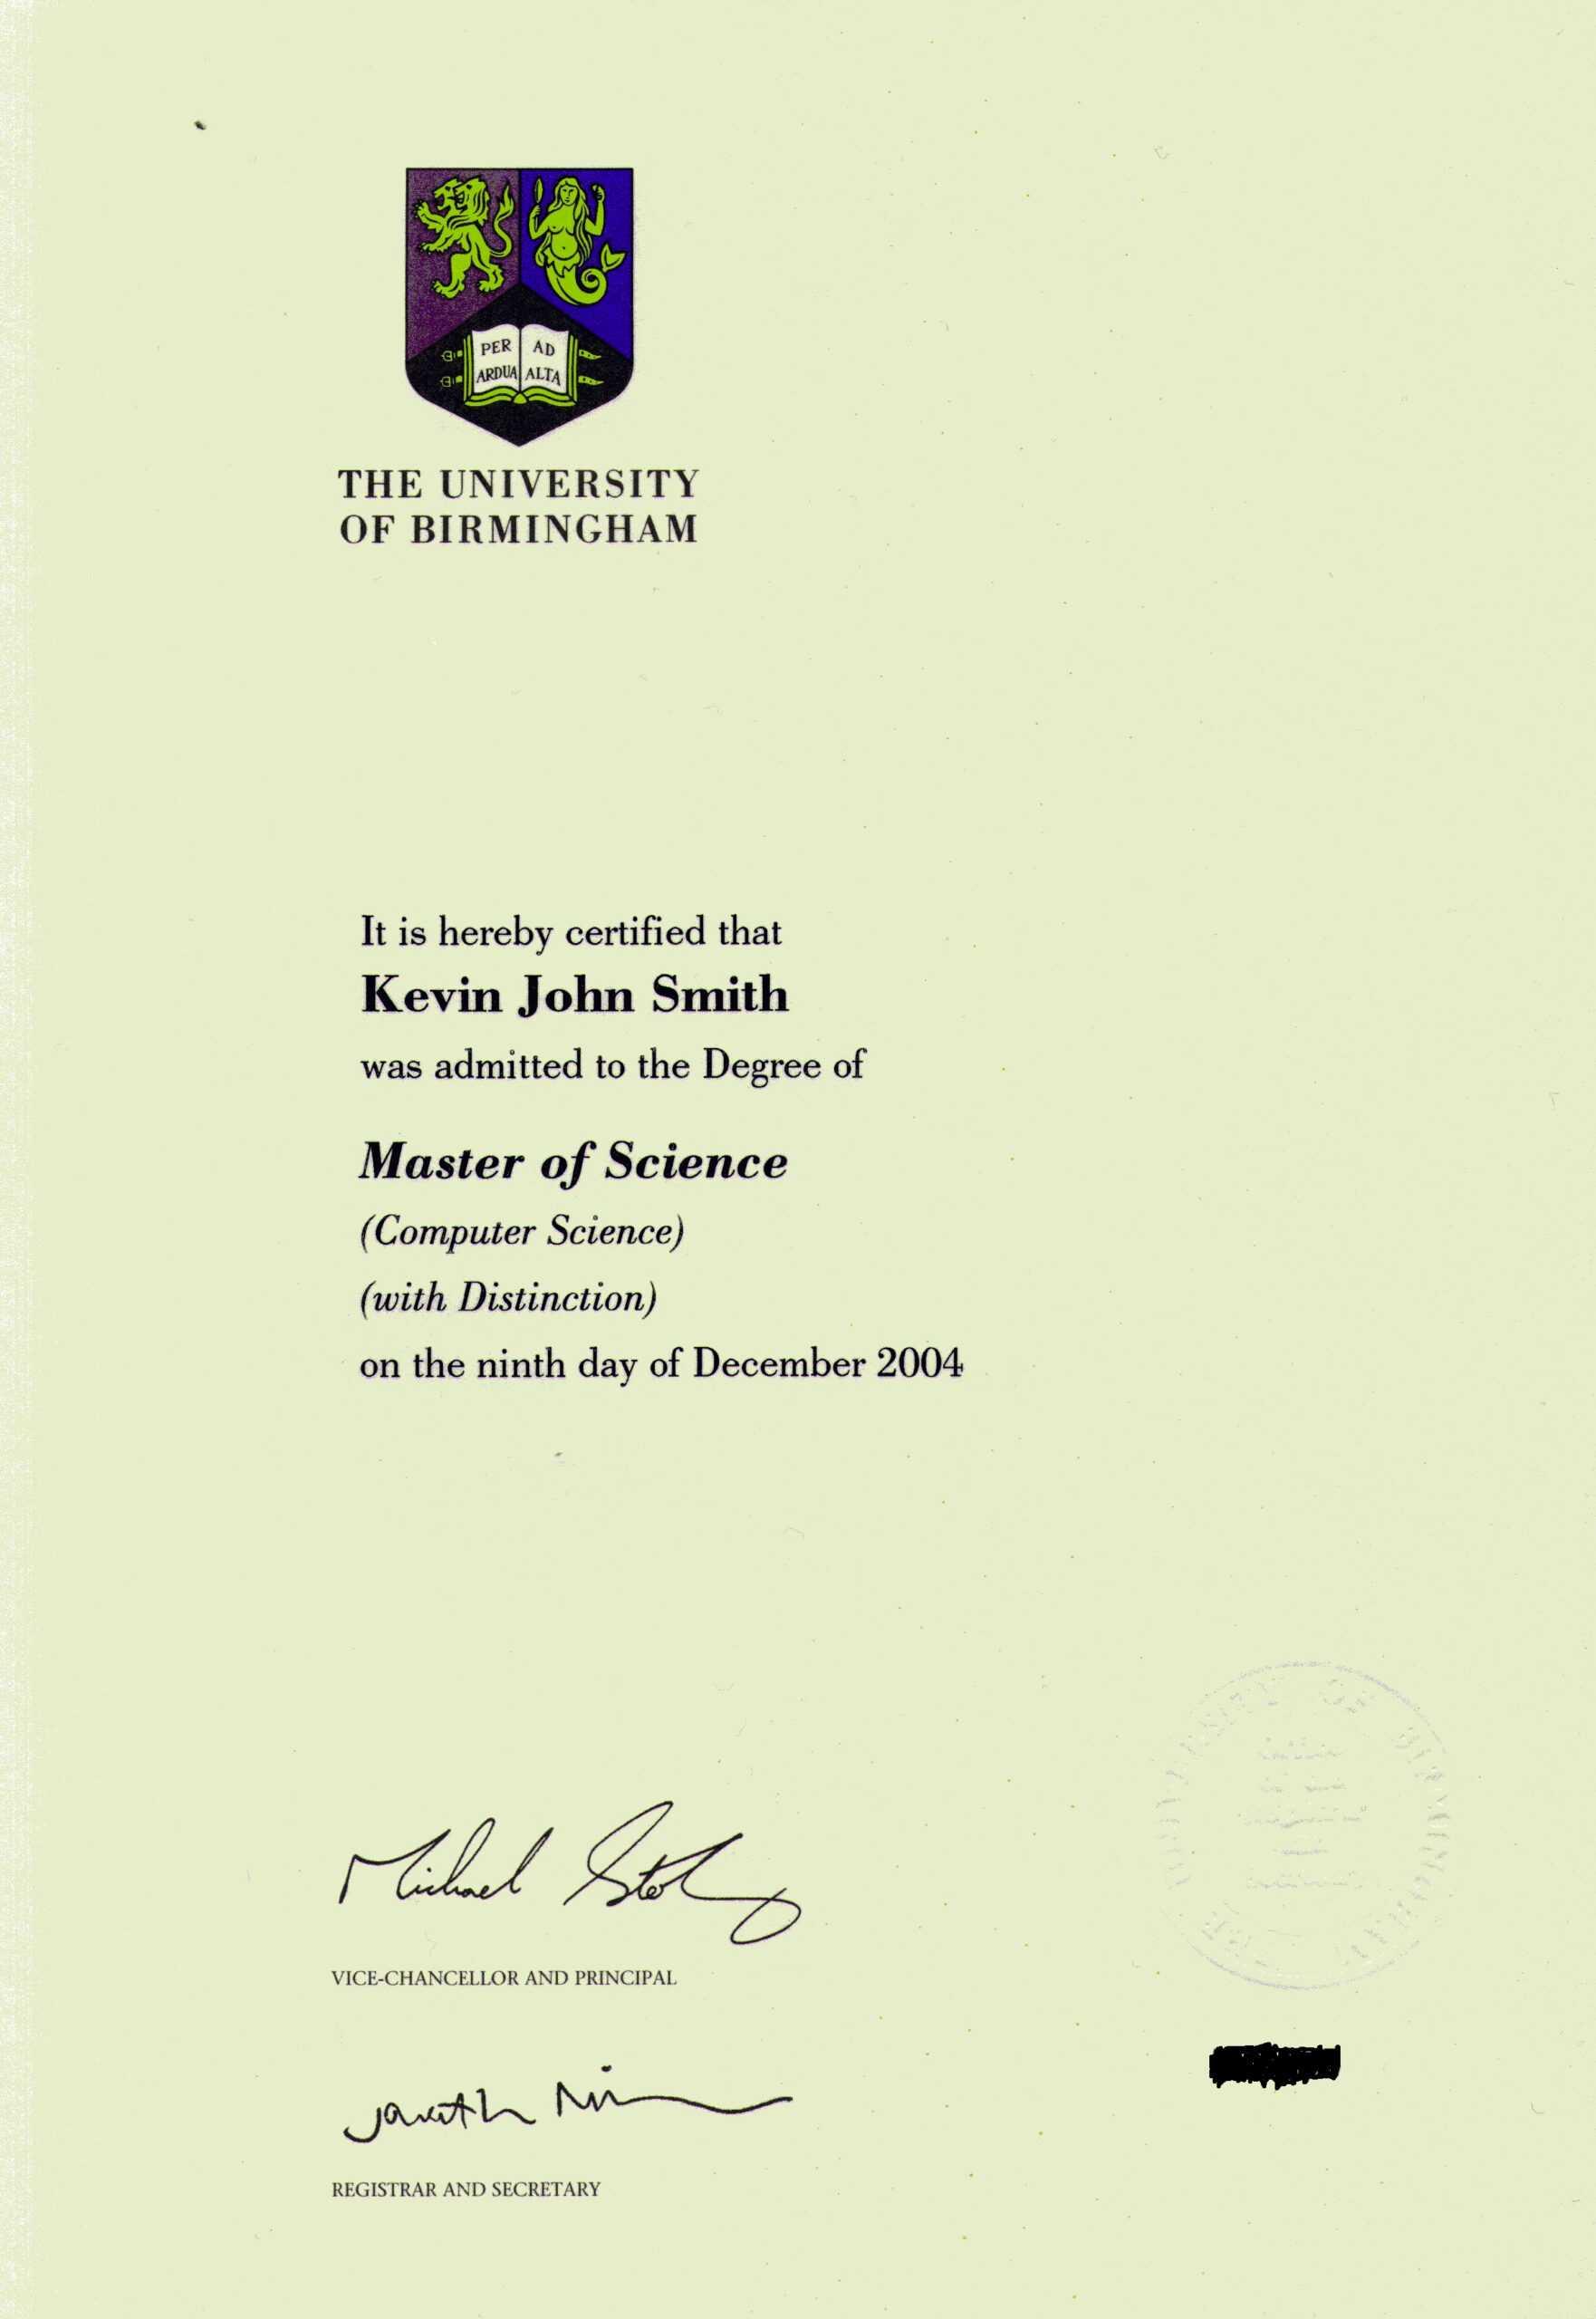 79 Open University Certificate Template, Certificate Open Within Masters Degree Certificate Template